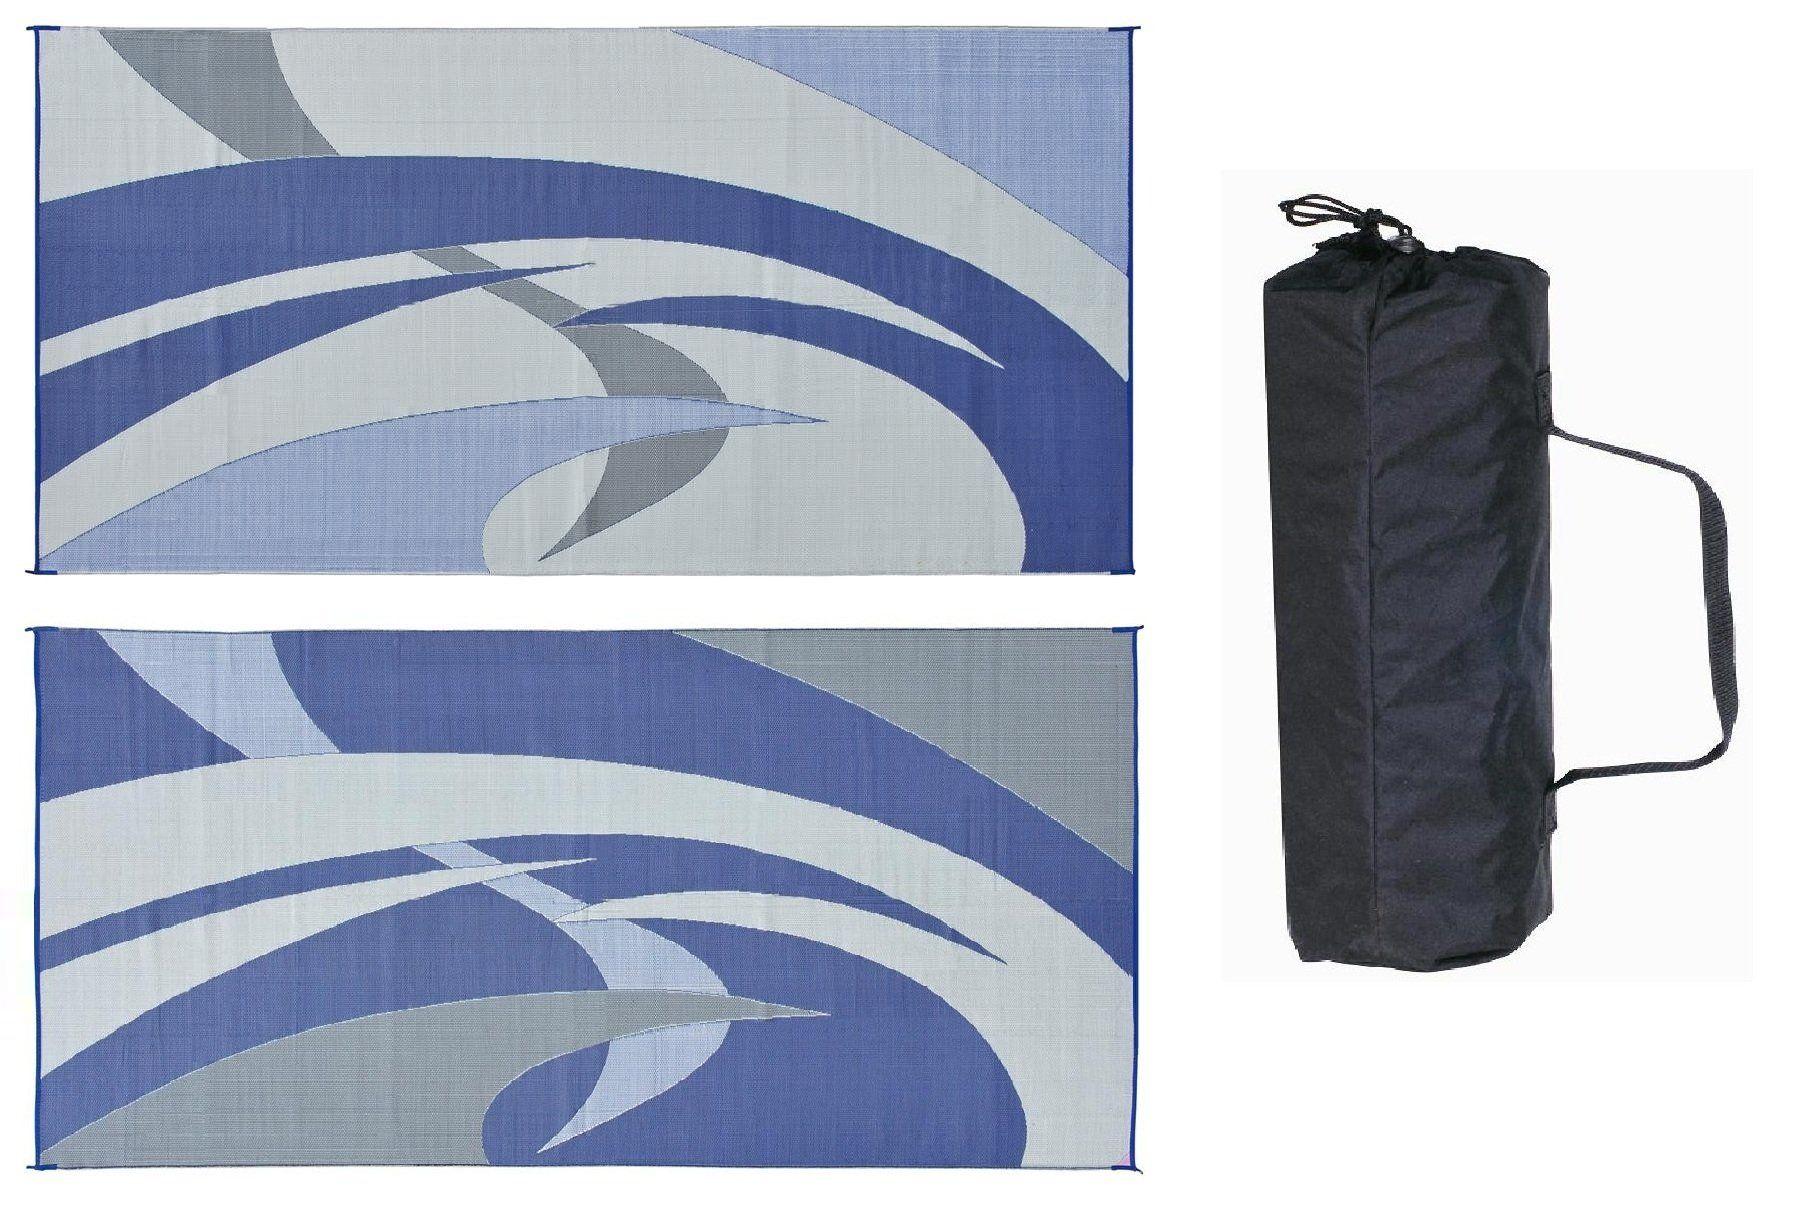 Reversible Mats Blue Grey 9x18 RV Patio Mat You can